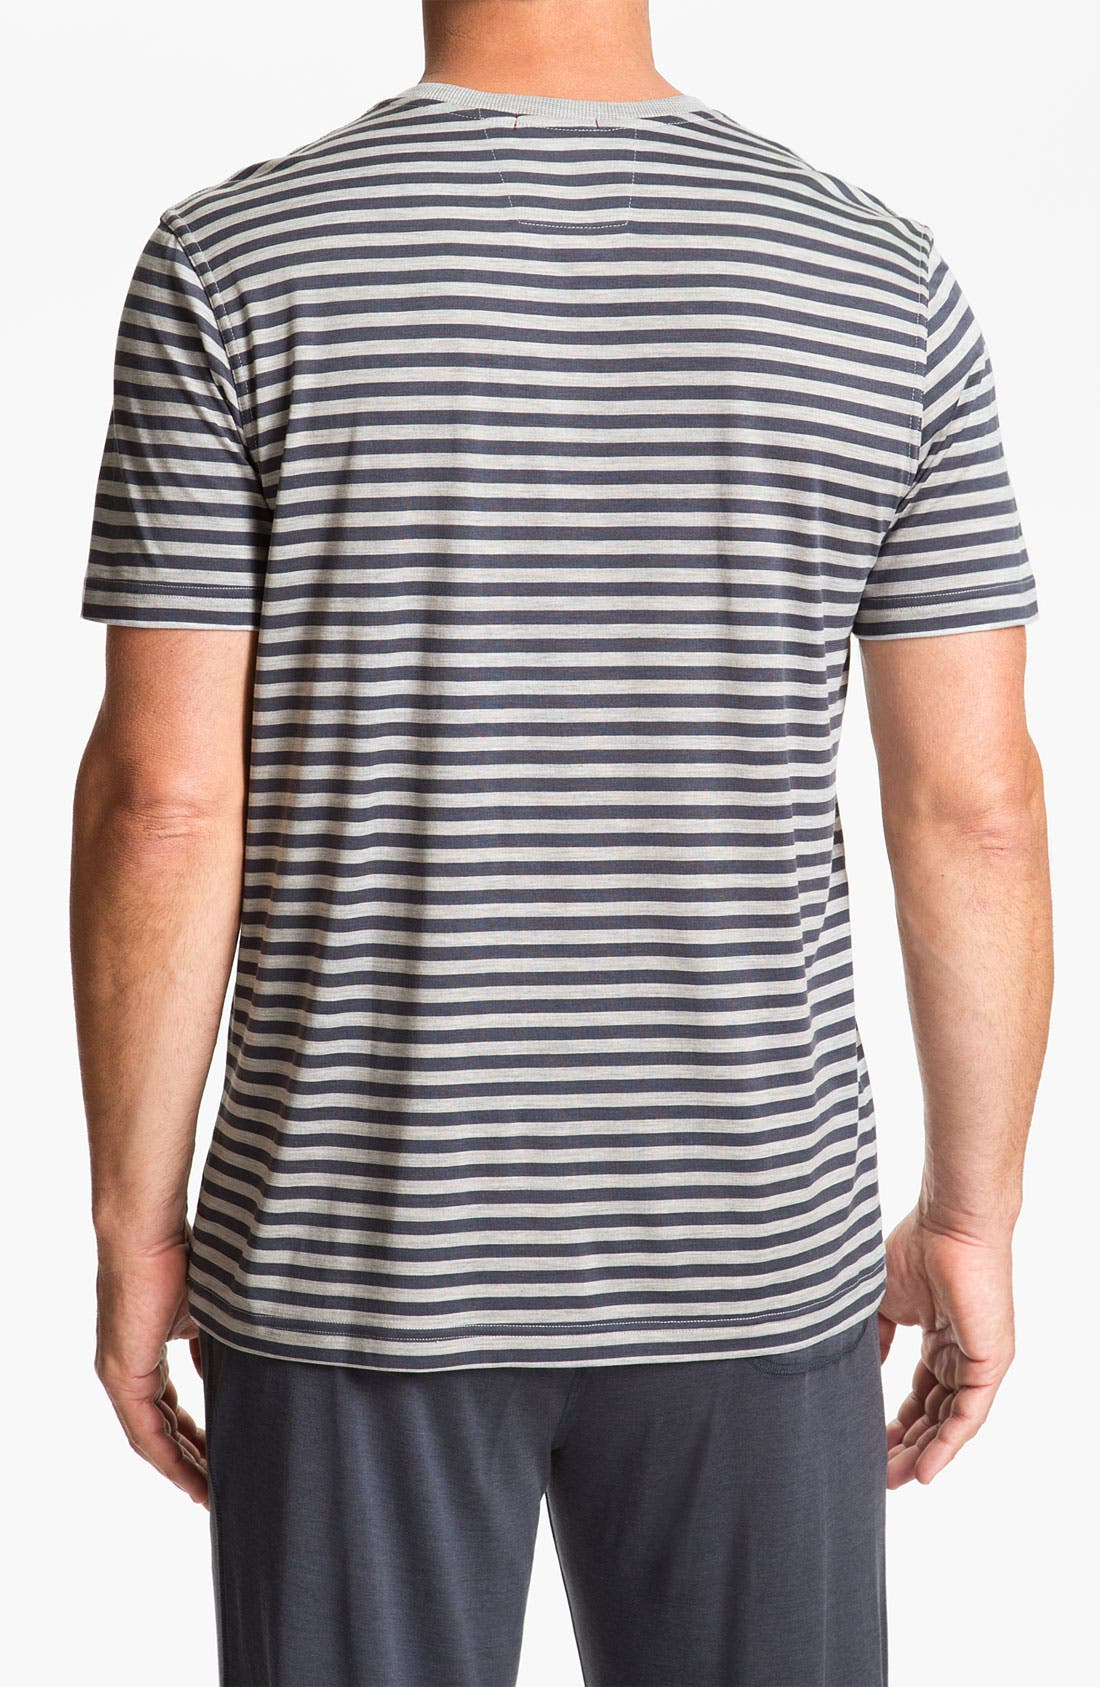 Alternate Image 2  - Daniel Buchler Silk Blend Heathered Stripe T-Shirt